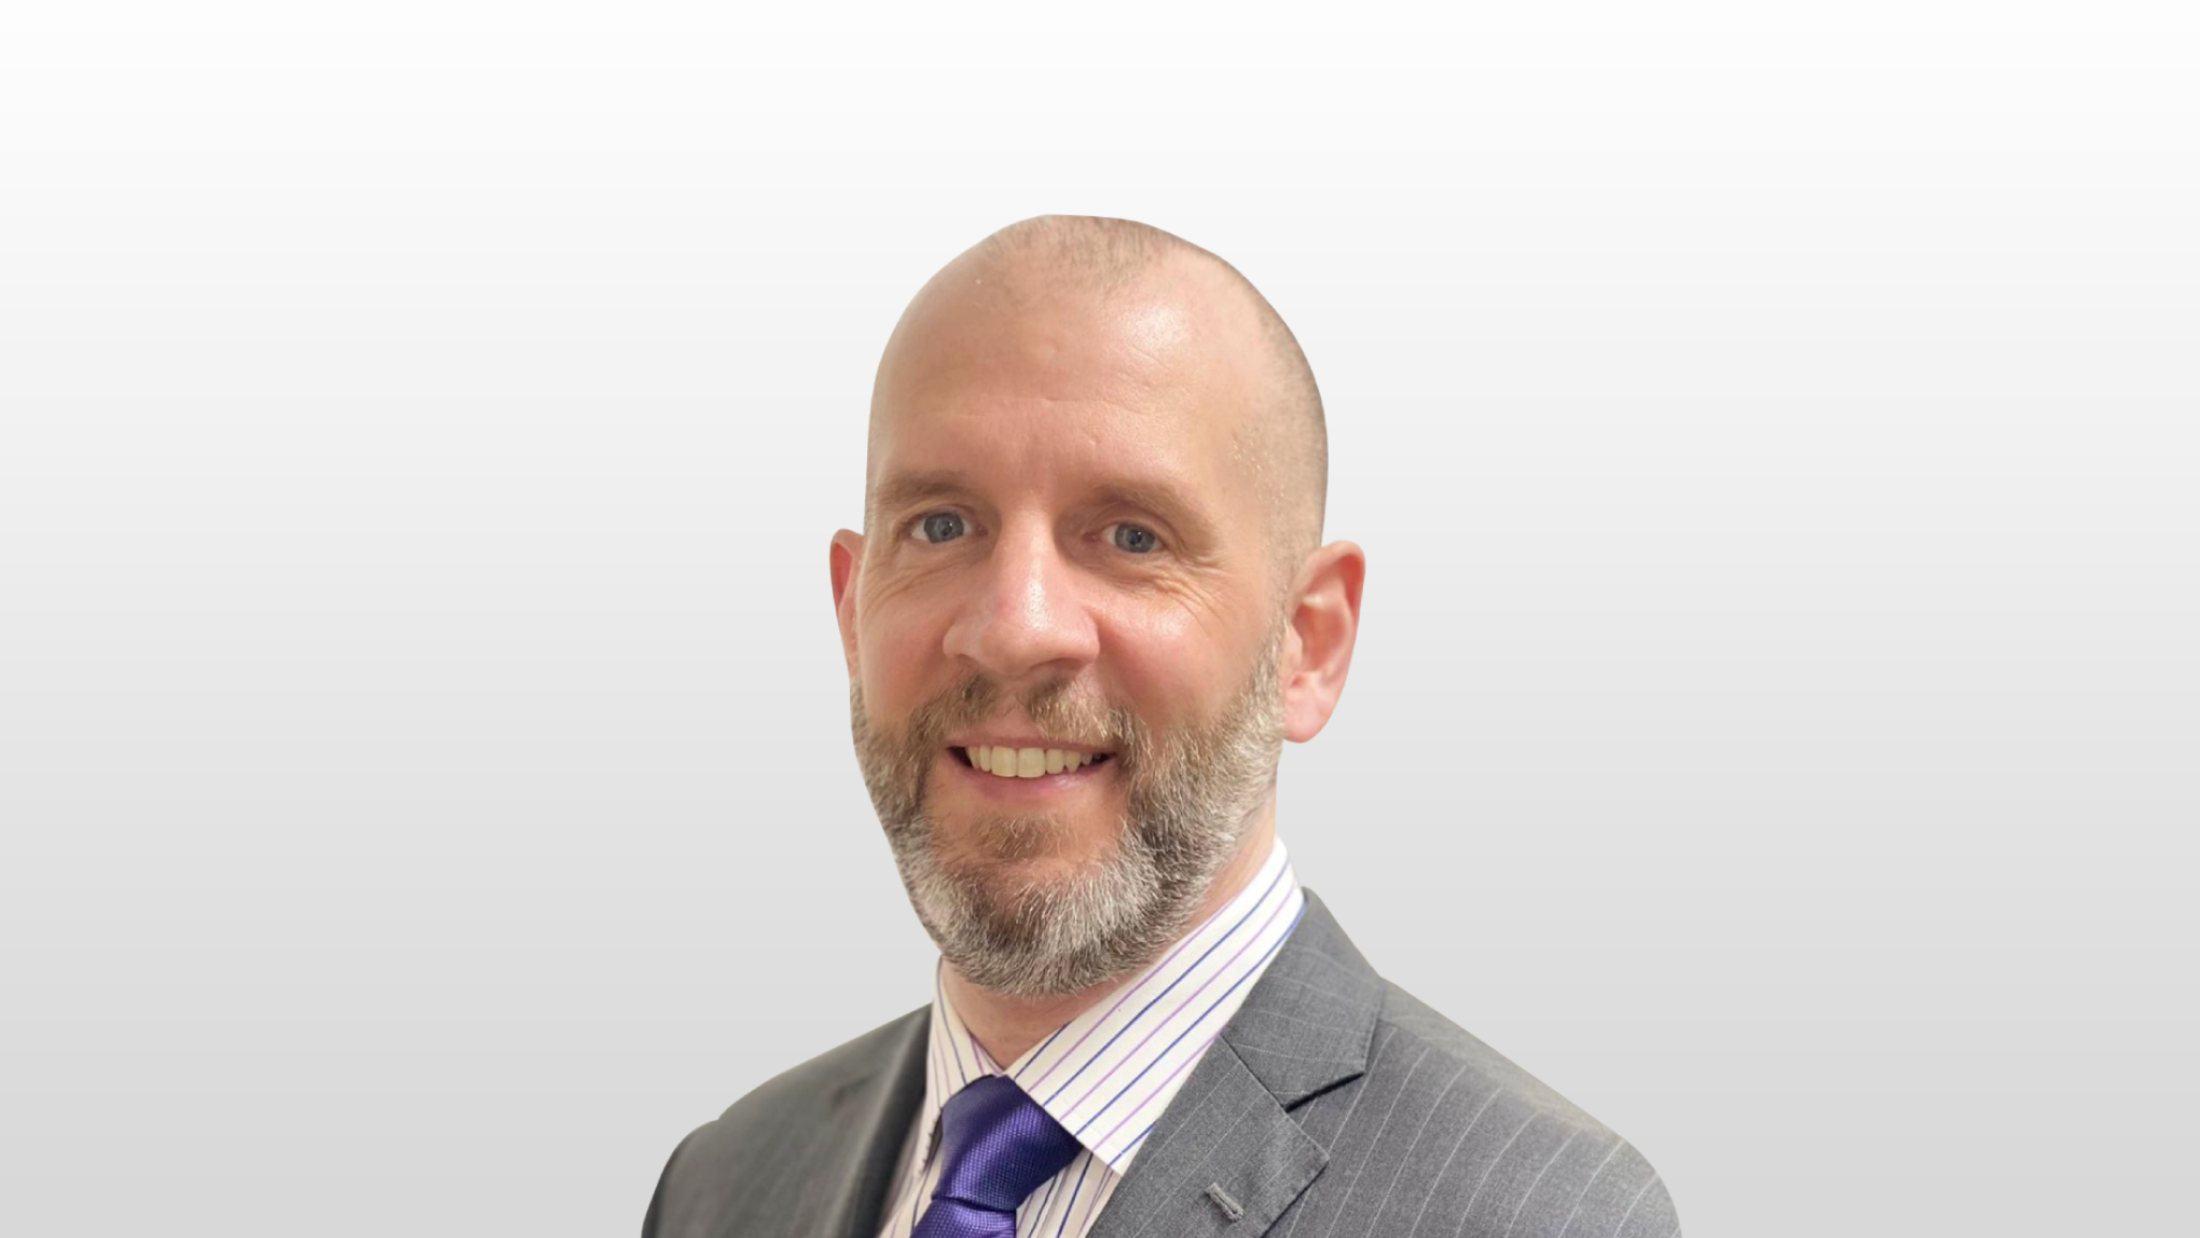 Chris Hussey, Group Internal Audit Director, AXA UK and Ireland